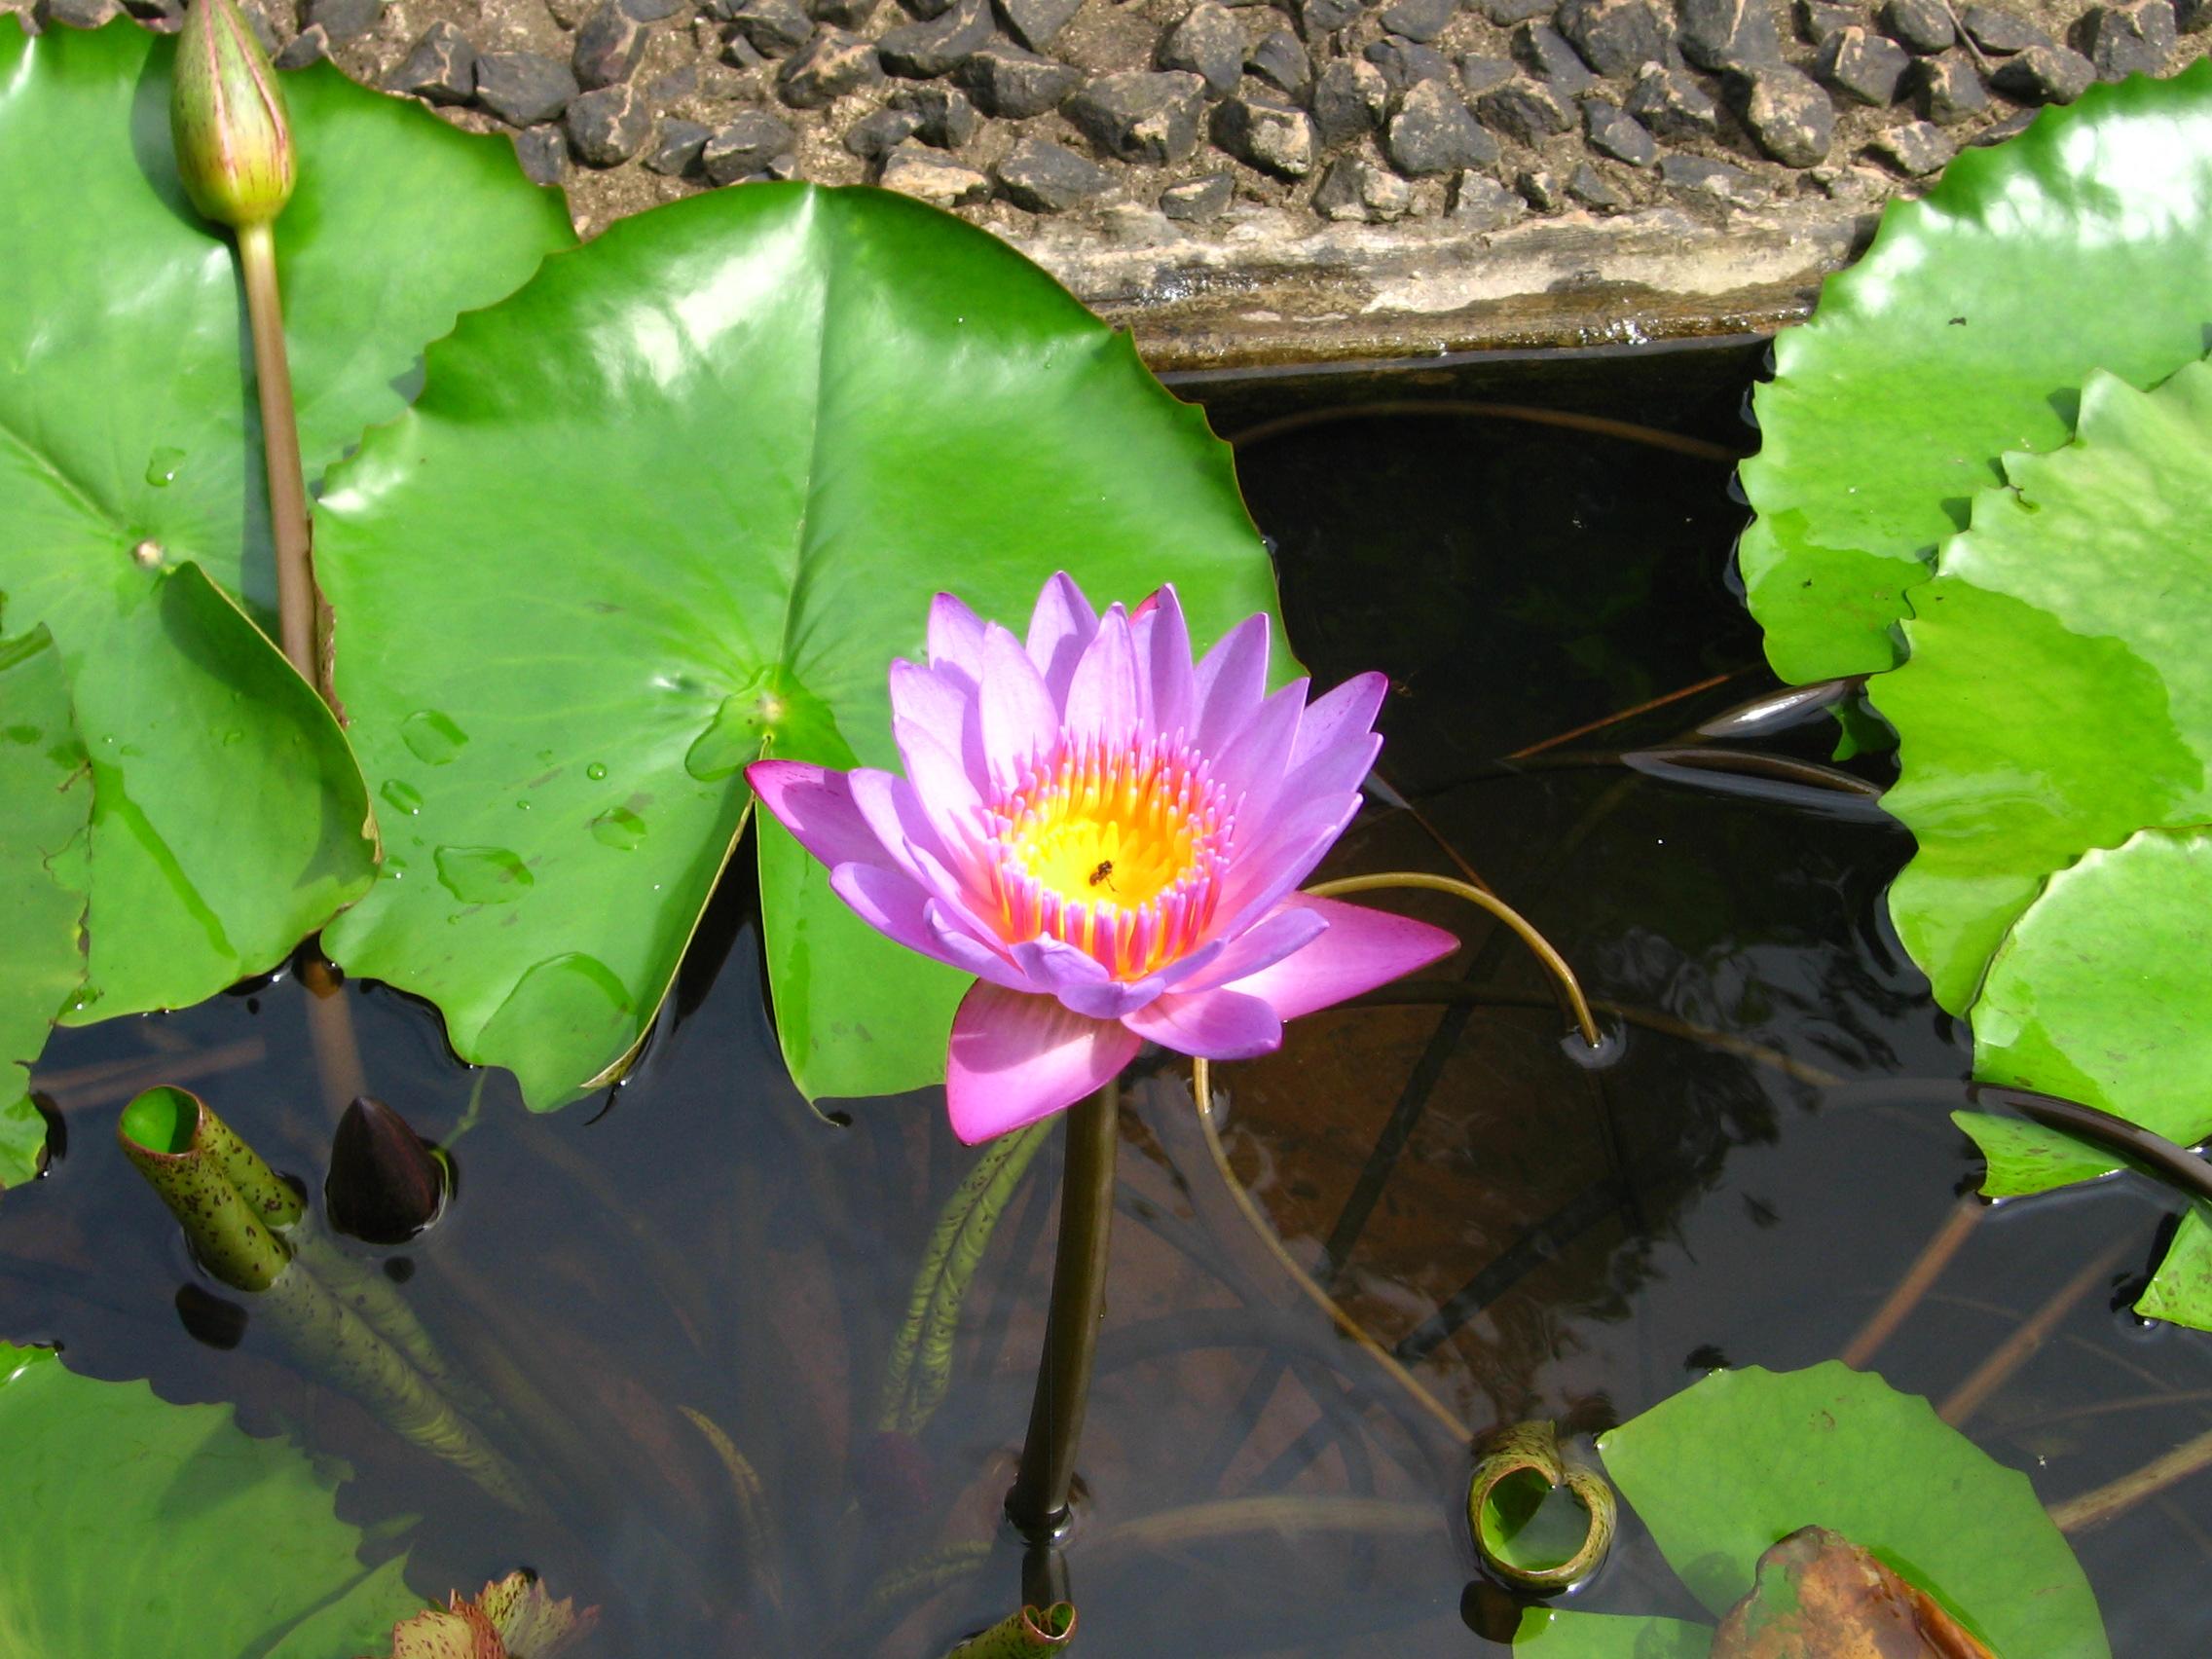 Filelotus flower in konkag wikimedia commons informationabout reusing filelotus flower in konkag izmirmasajfo Images